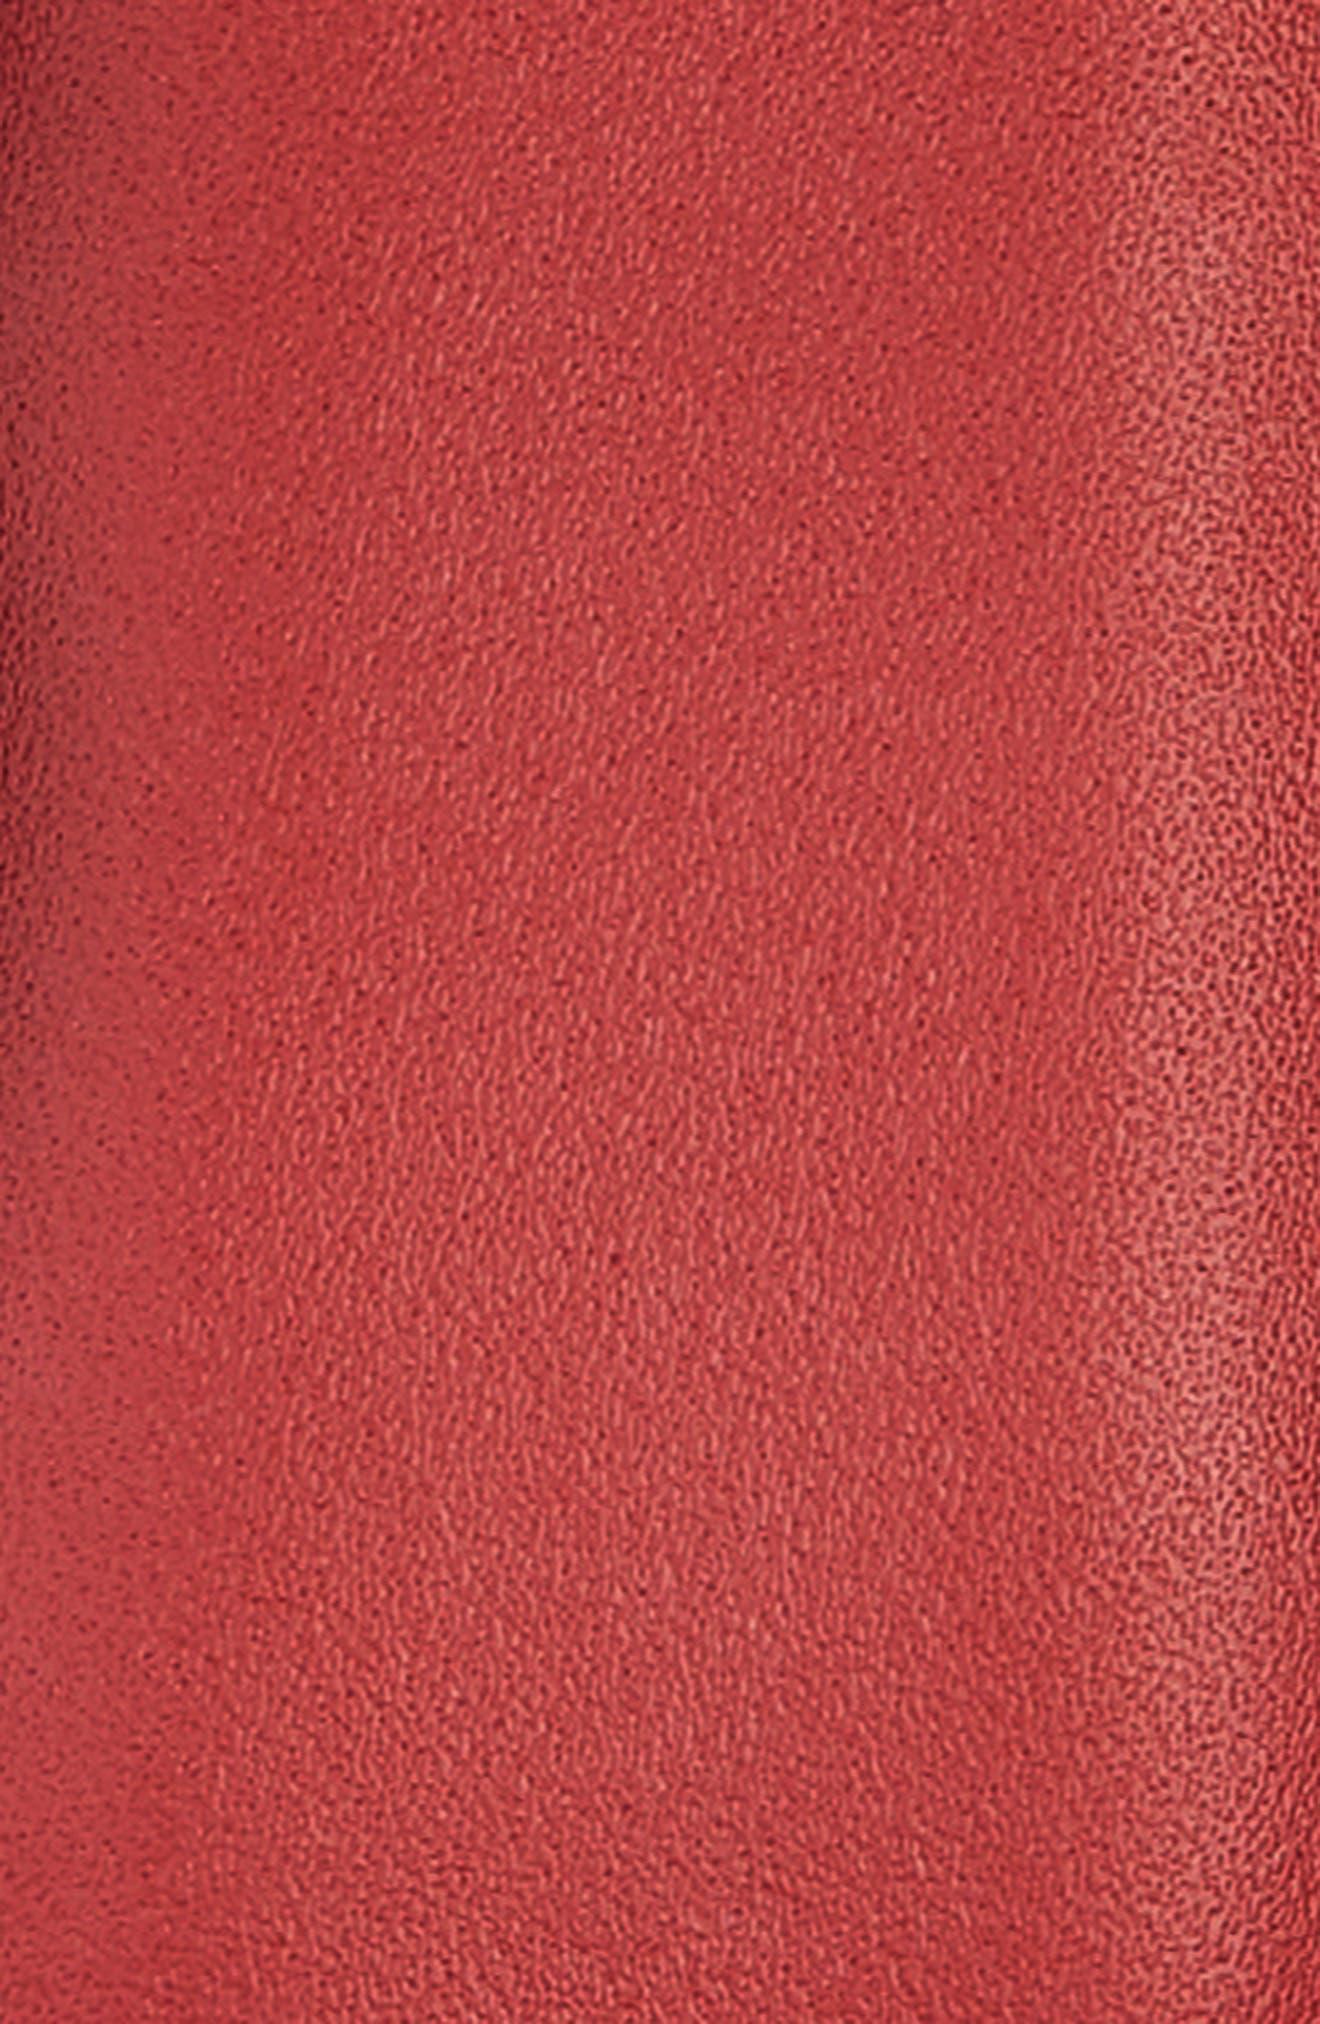 SALVATORE FERRAGAMO Belts Leather Belt